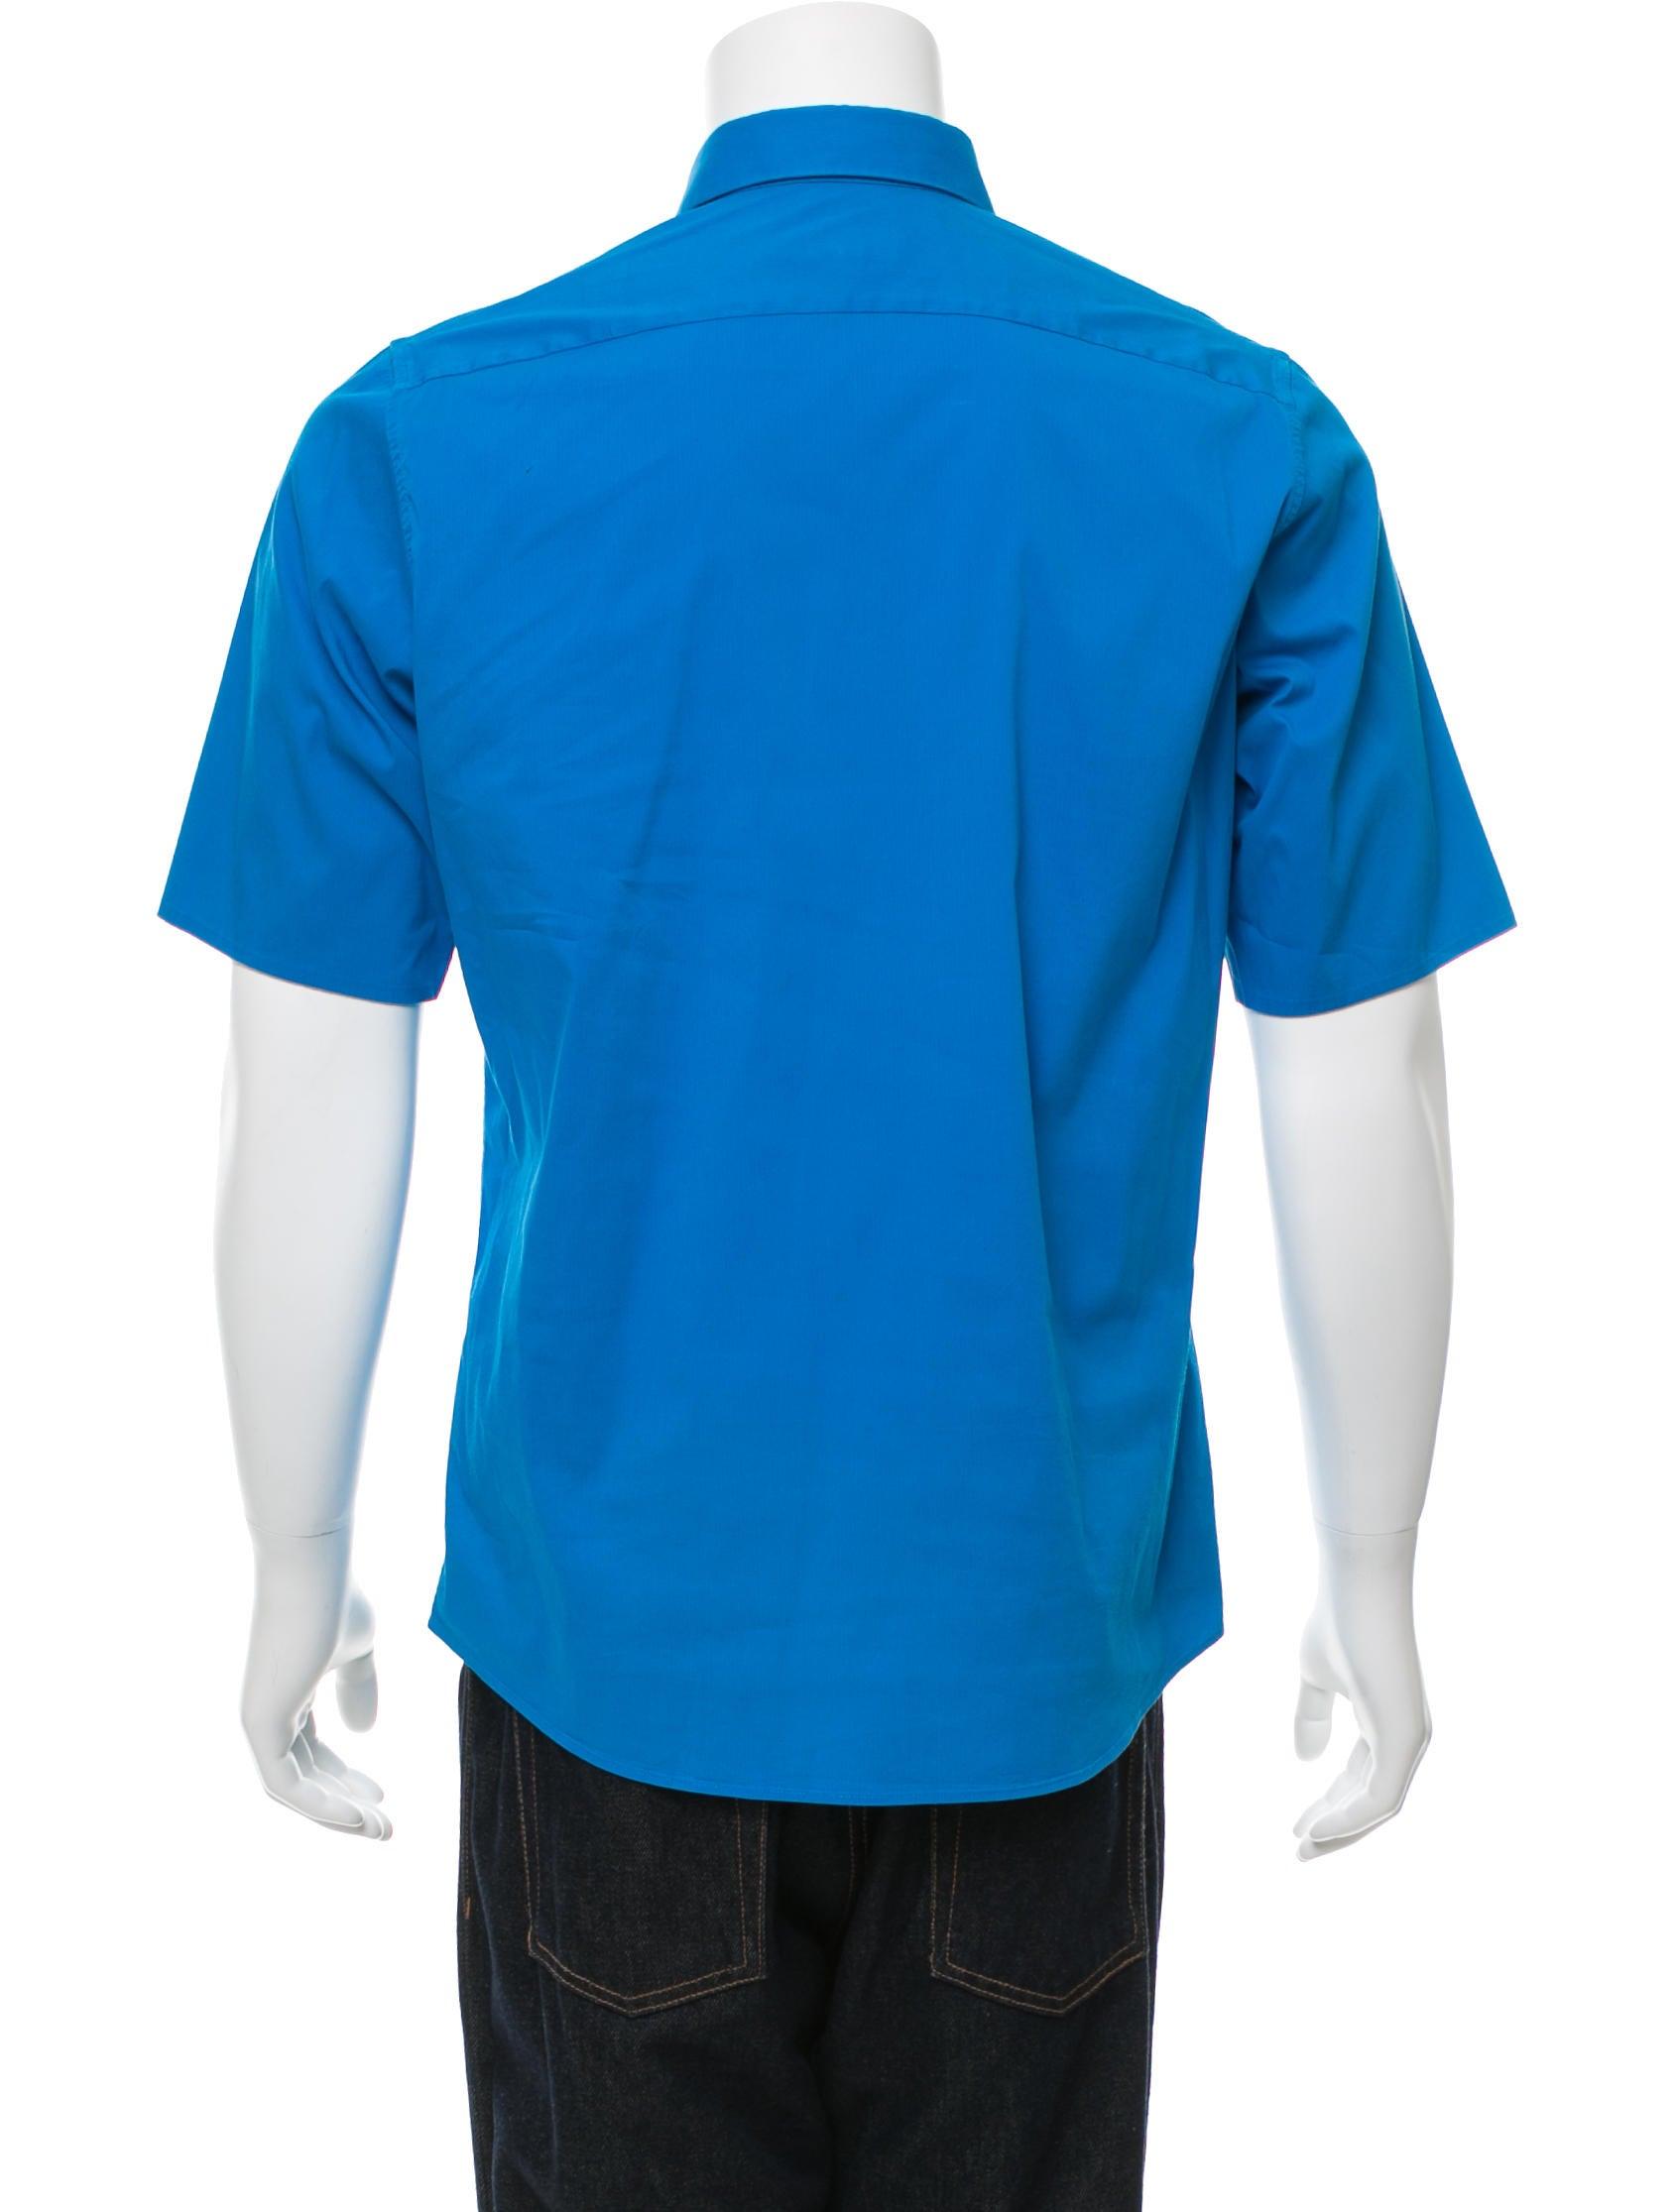 Jil sander woven button up shirt clothing jil36977 for Jil sander mens shirt